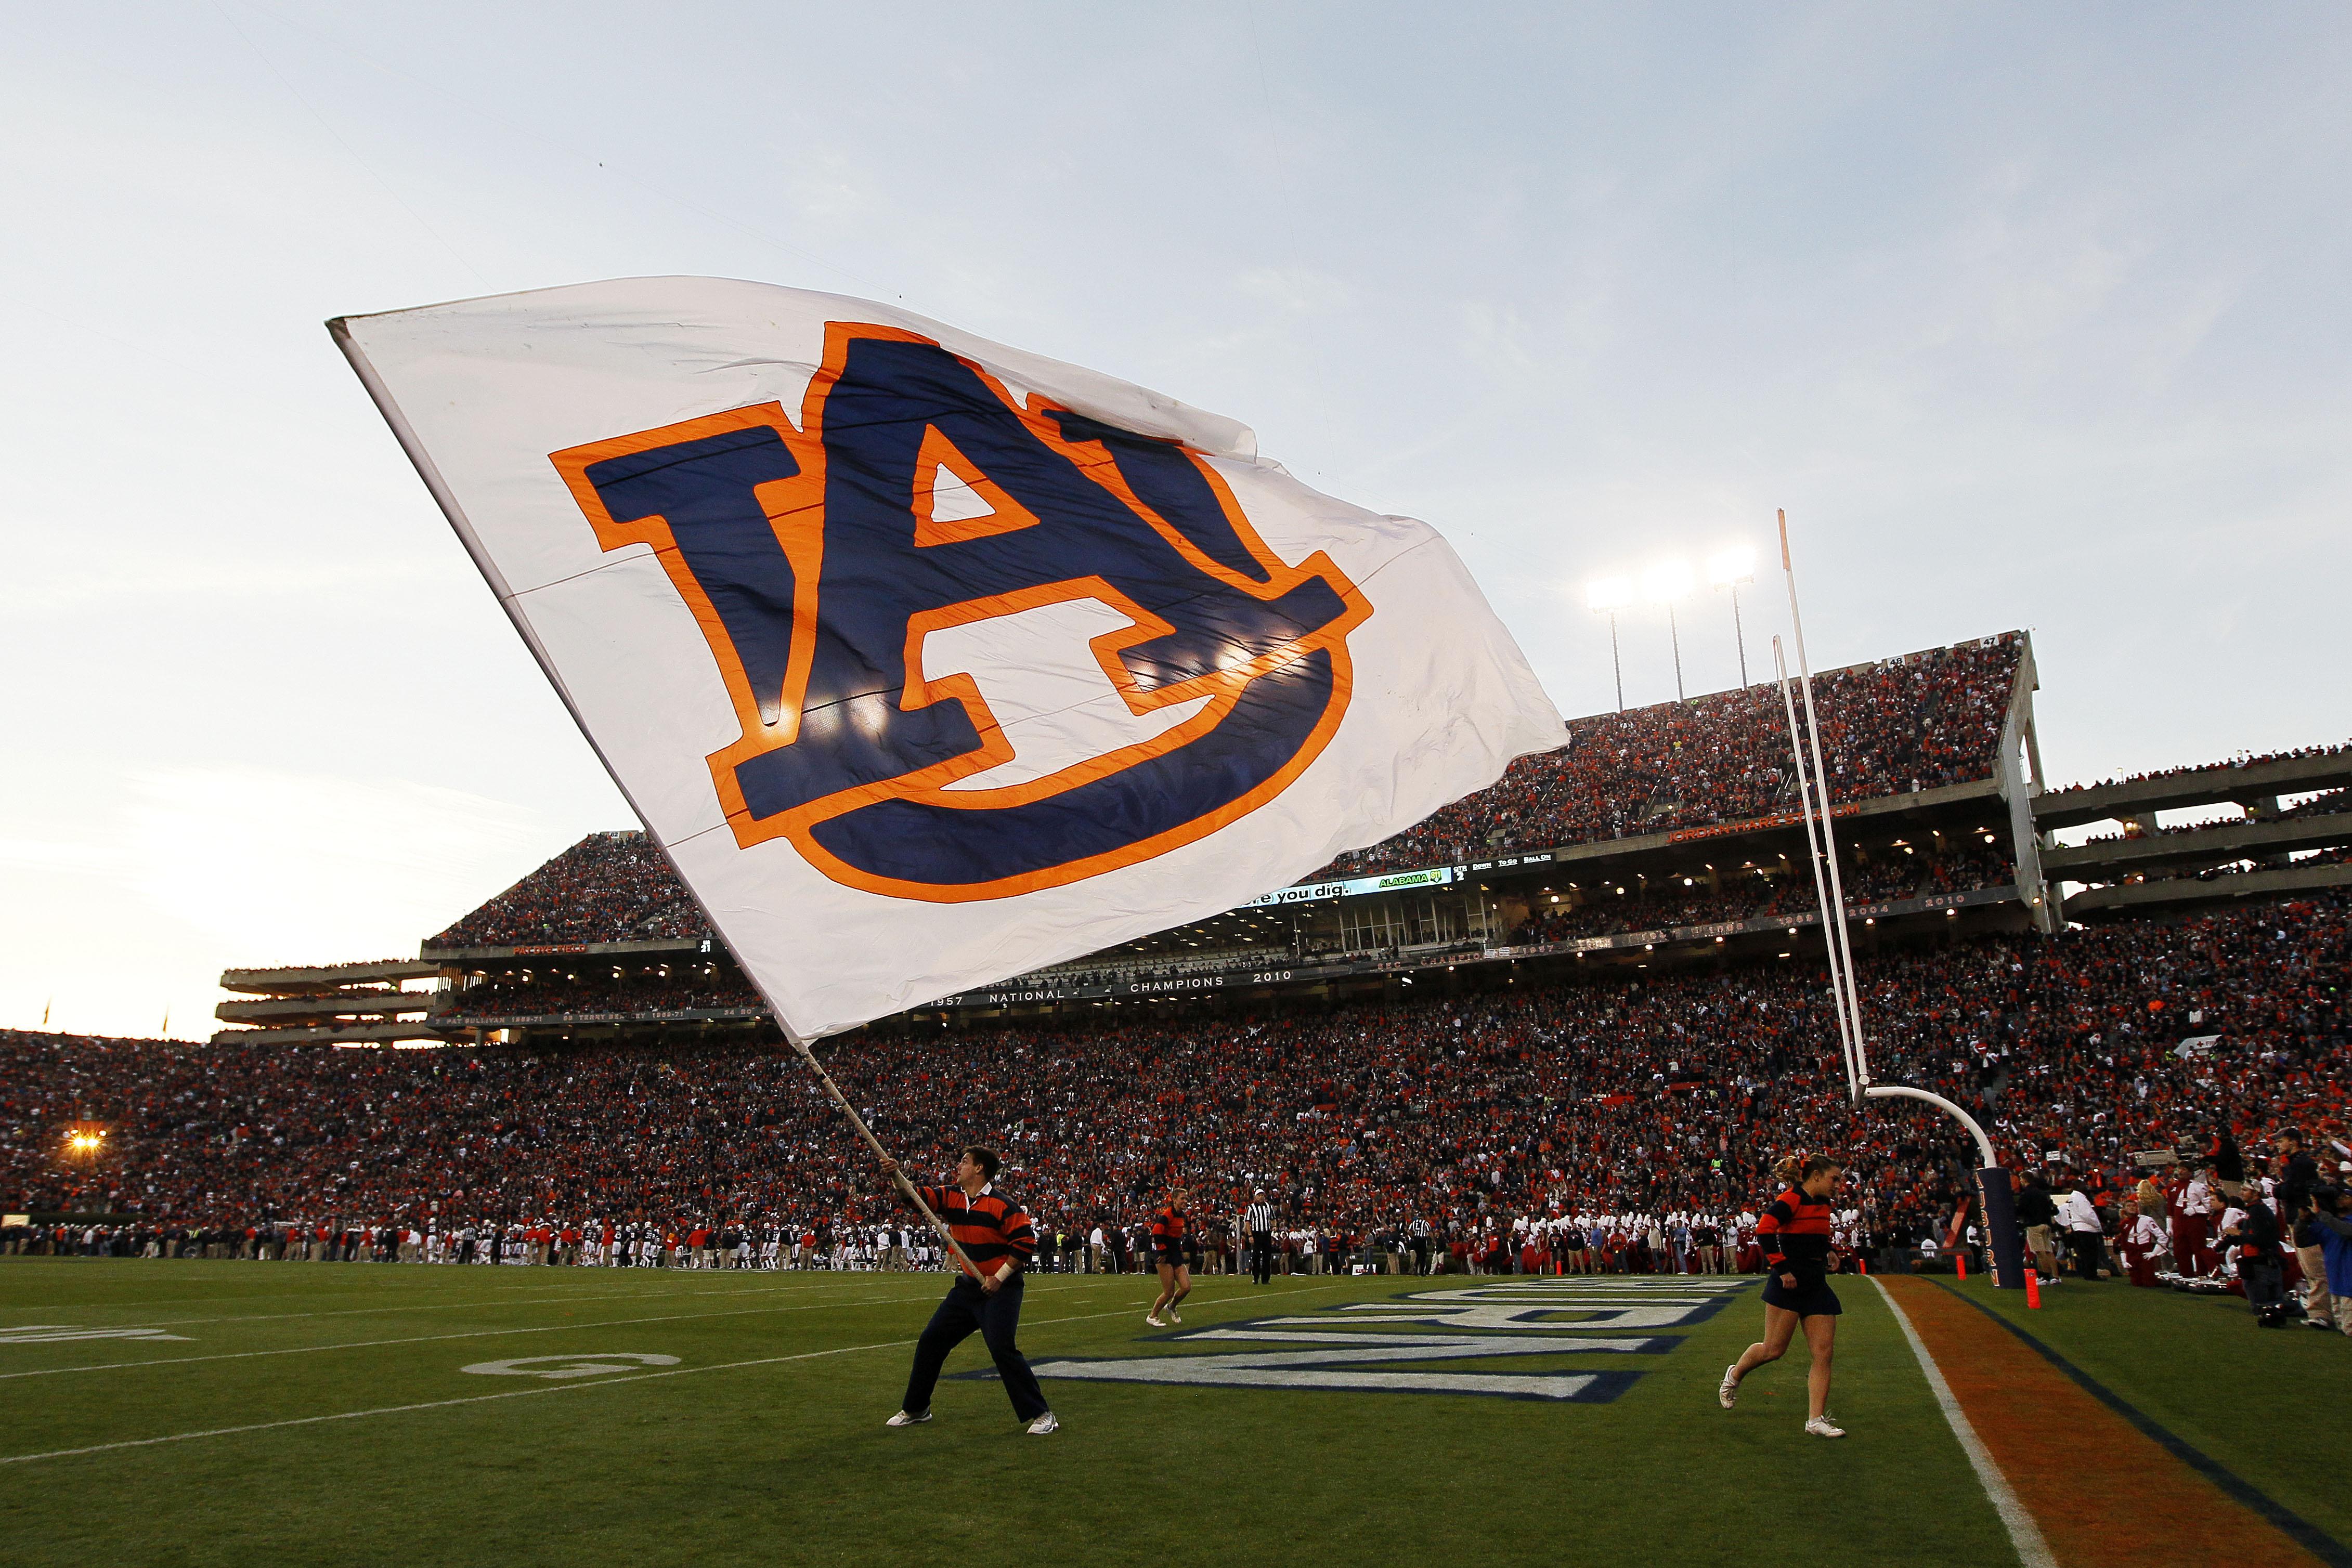 A member of Auburn Tigers cheer team waves a flag during their game against the Alabama Crimson Tide at Jordan-Hare Stadium on Nov. 30, 2013 in Auburn, Ala.